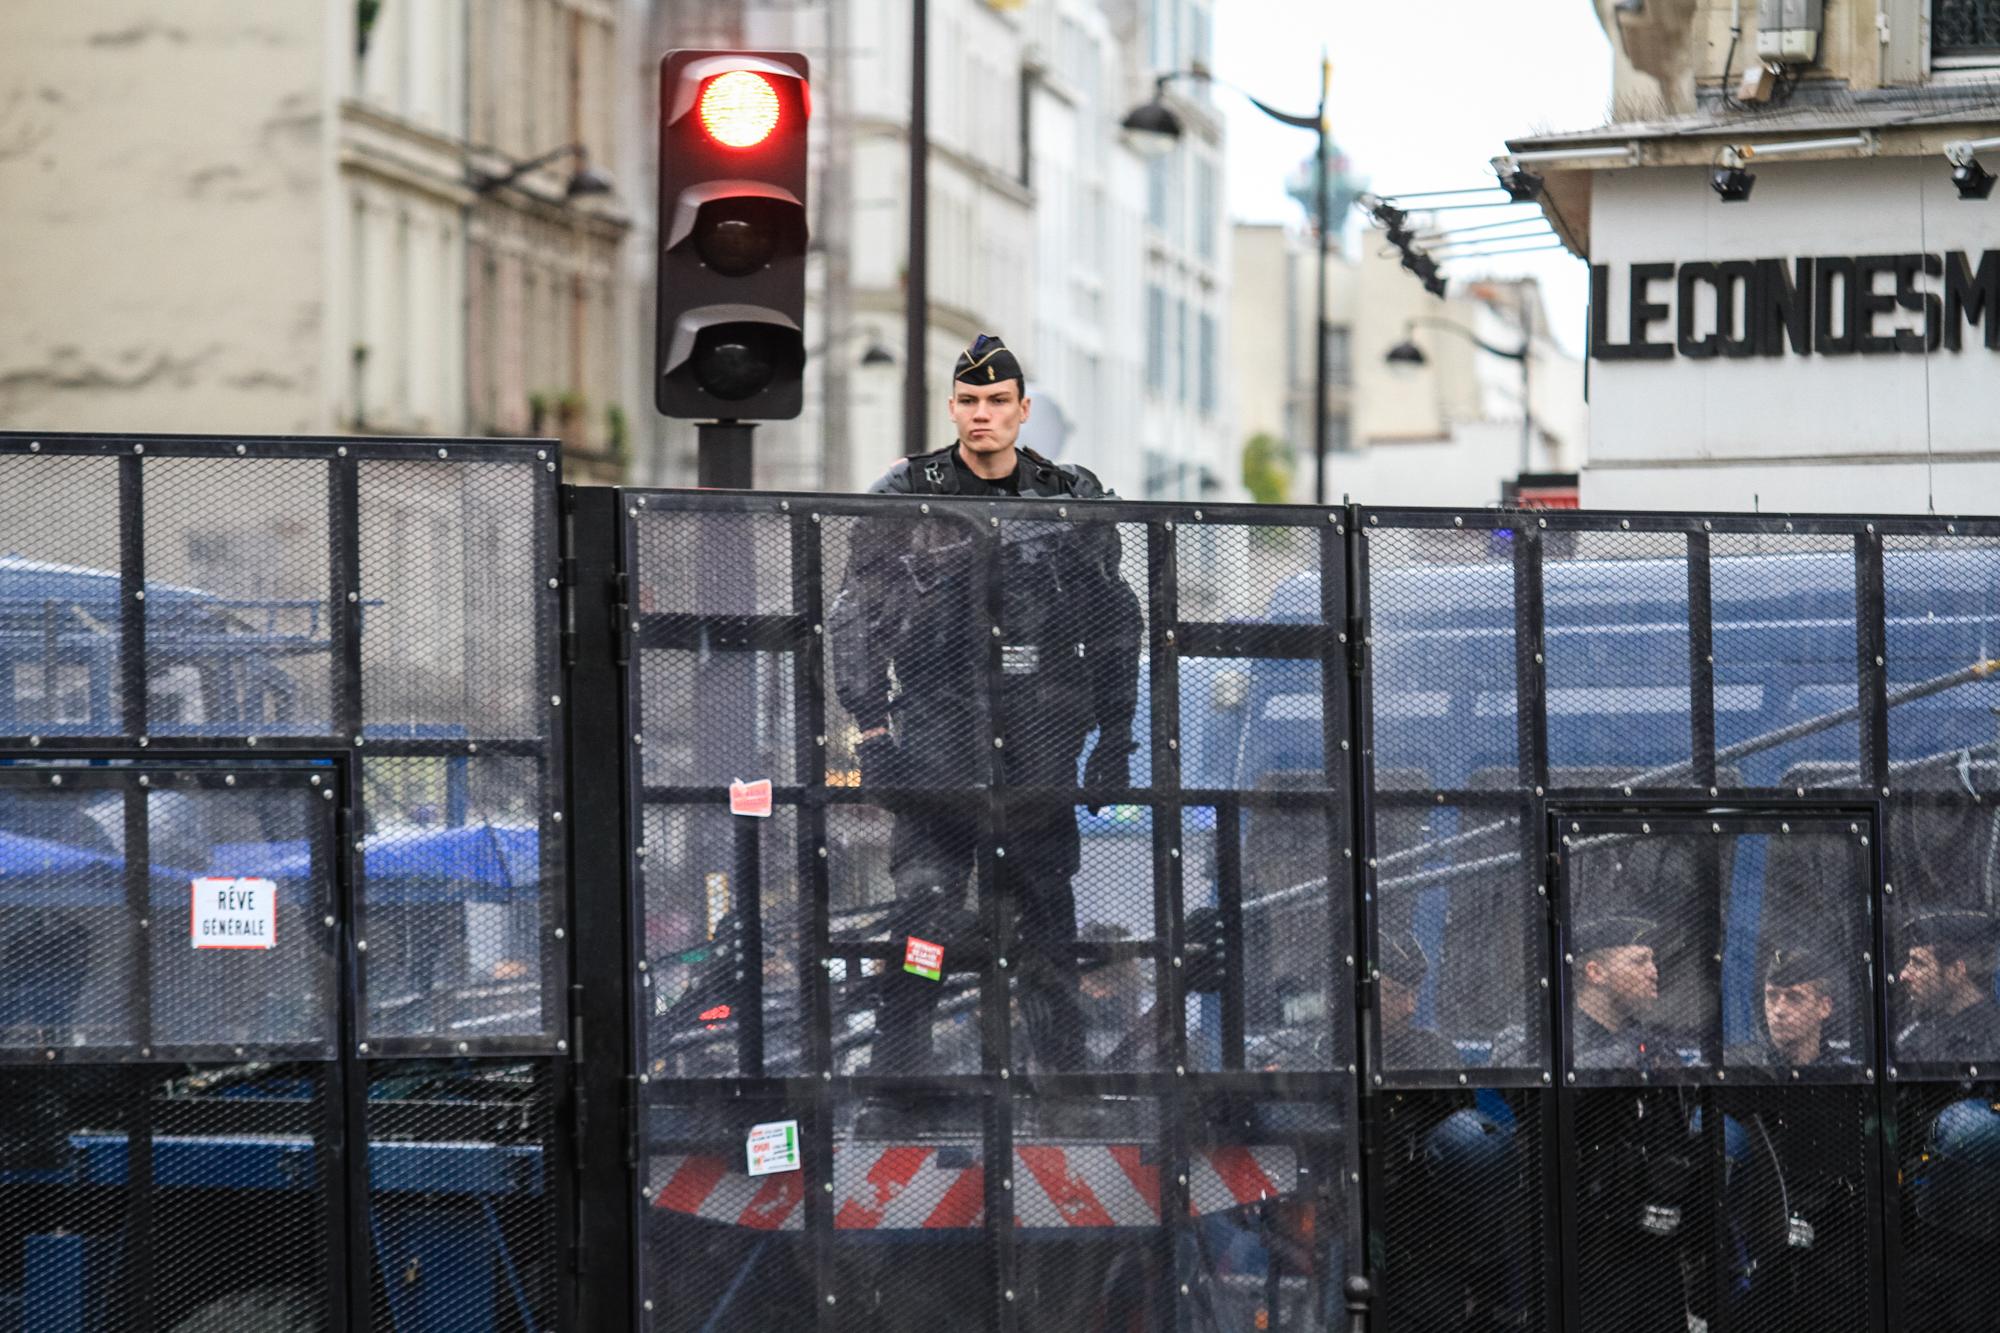 08-201703-MARCHE-CONTRE-VIOLENCES-POLICIERES©Augustin-Le_Gall-Haytham-Pictures-IMG_3571.jpg